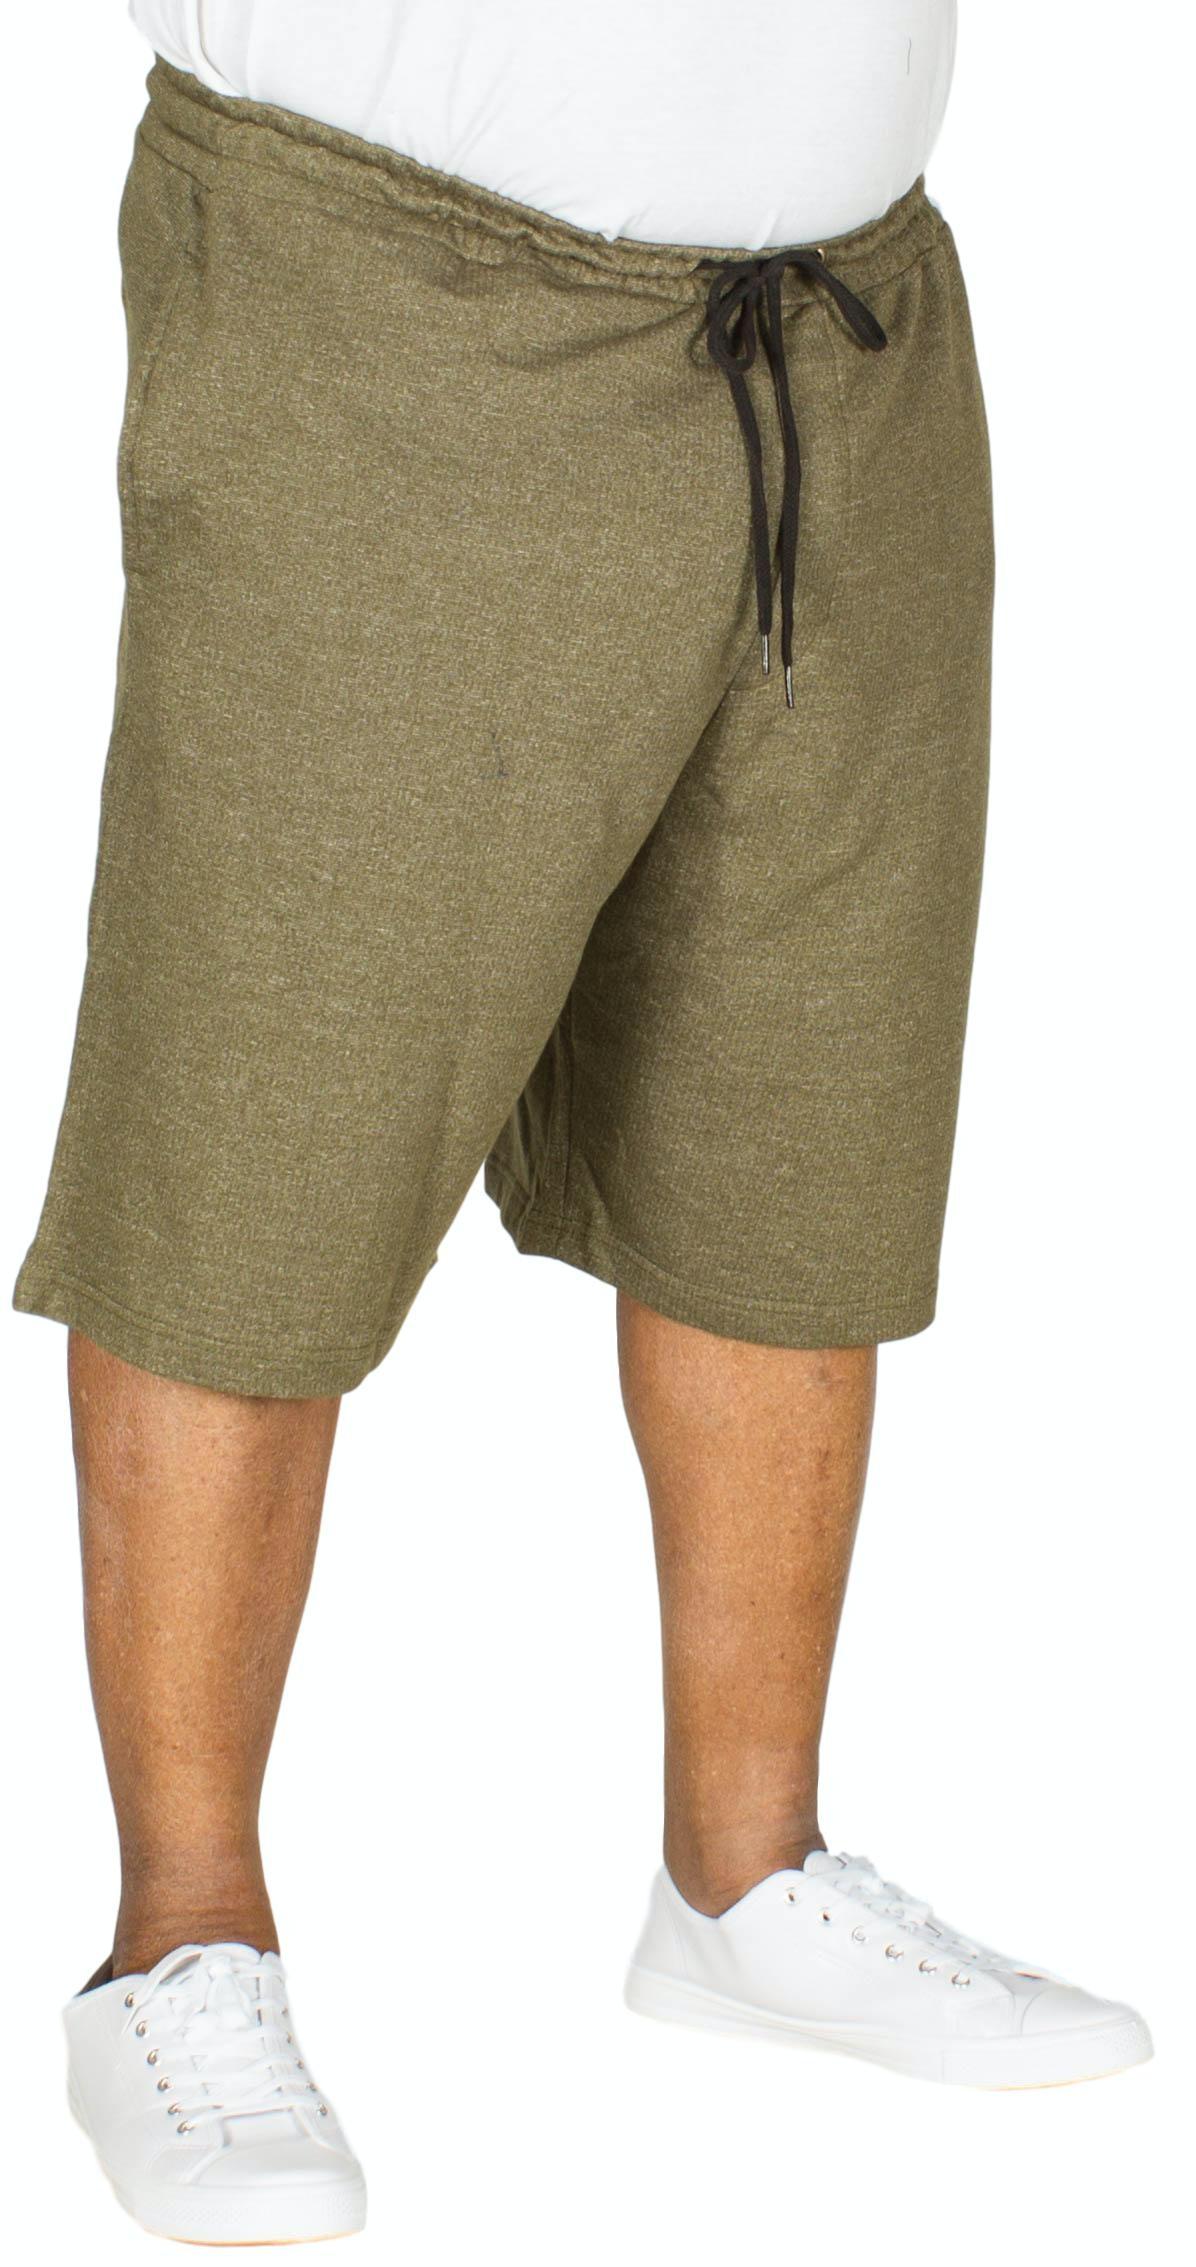 Bigdude Marl Jogger Shorts Olive